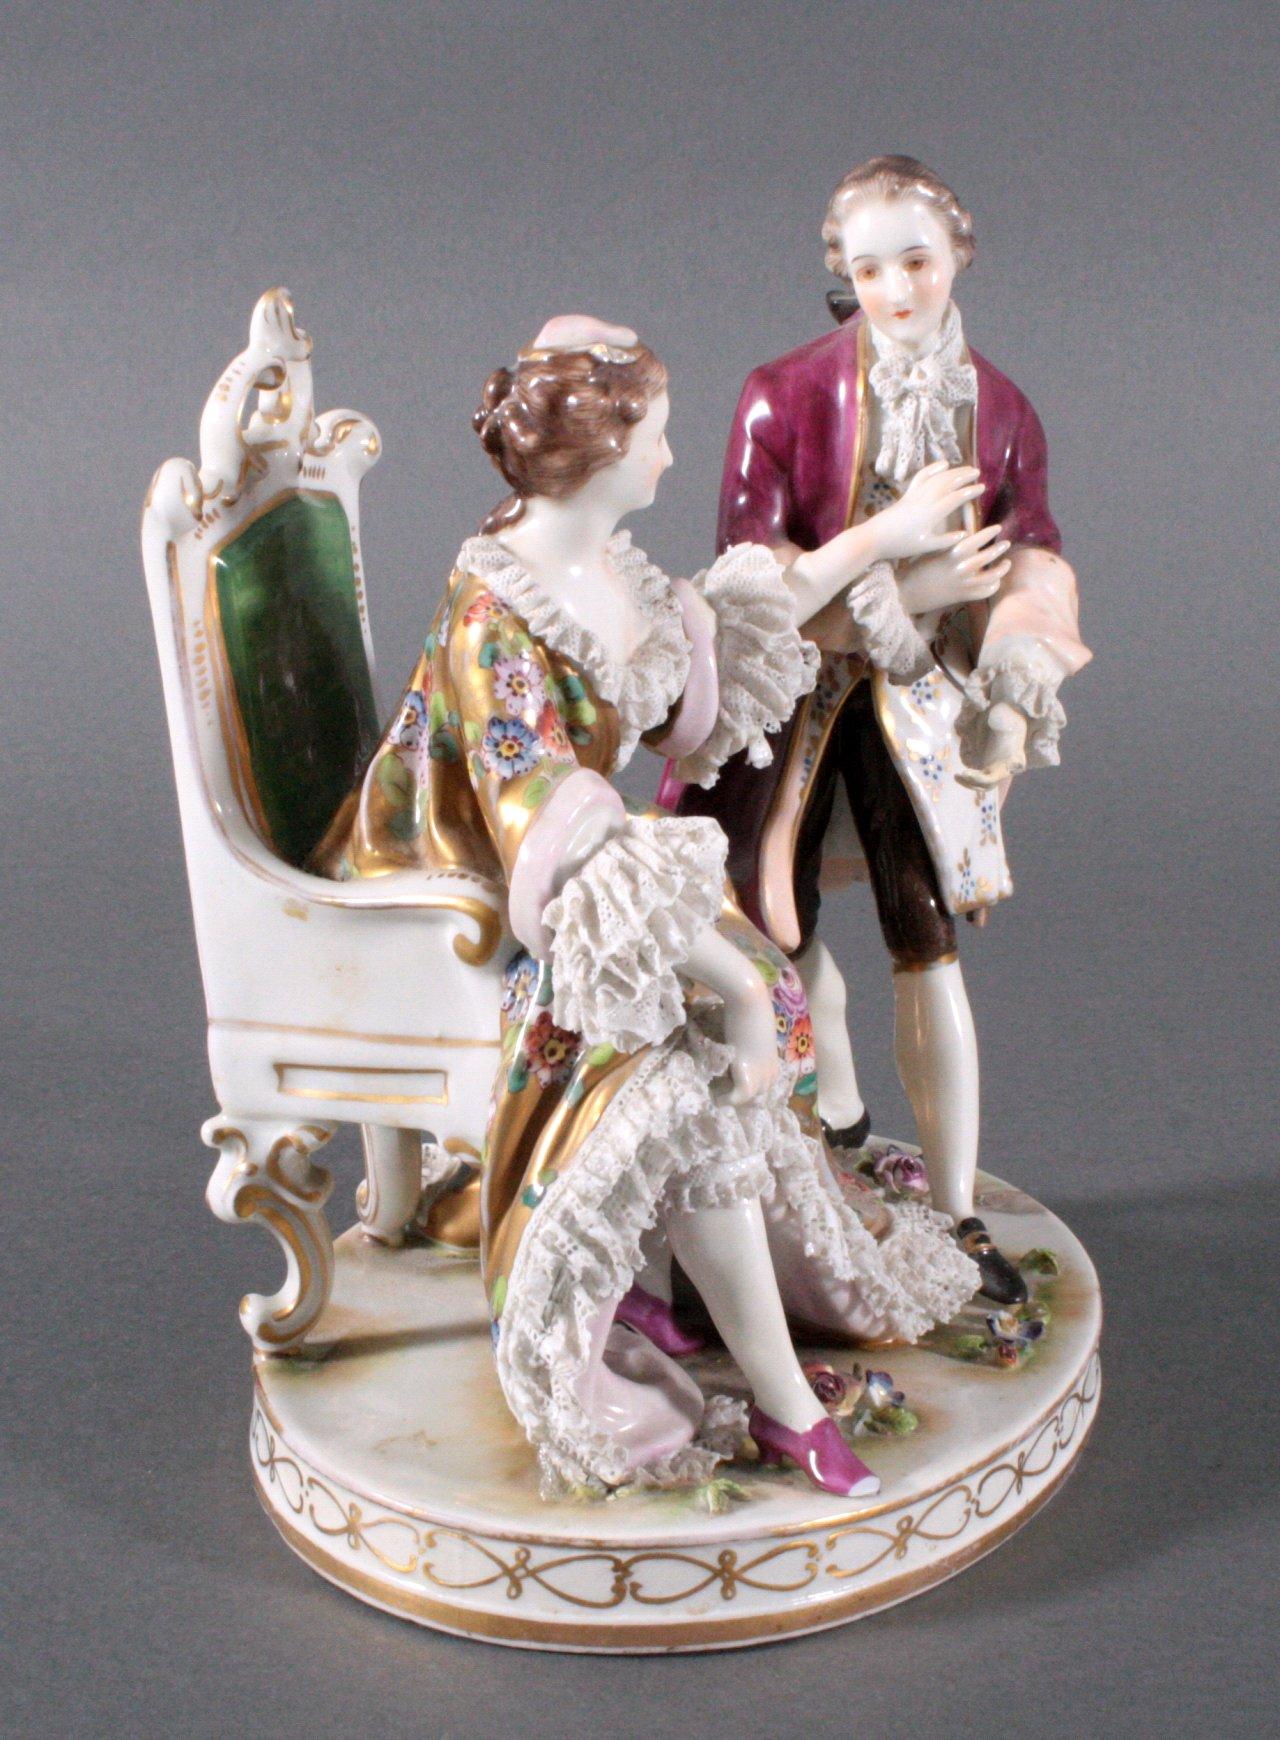 Porzellan-Skulptur, Aelteste Vokstedter-3